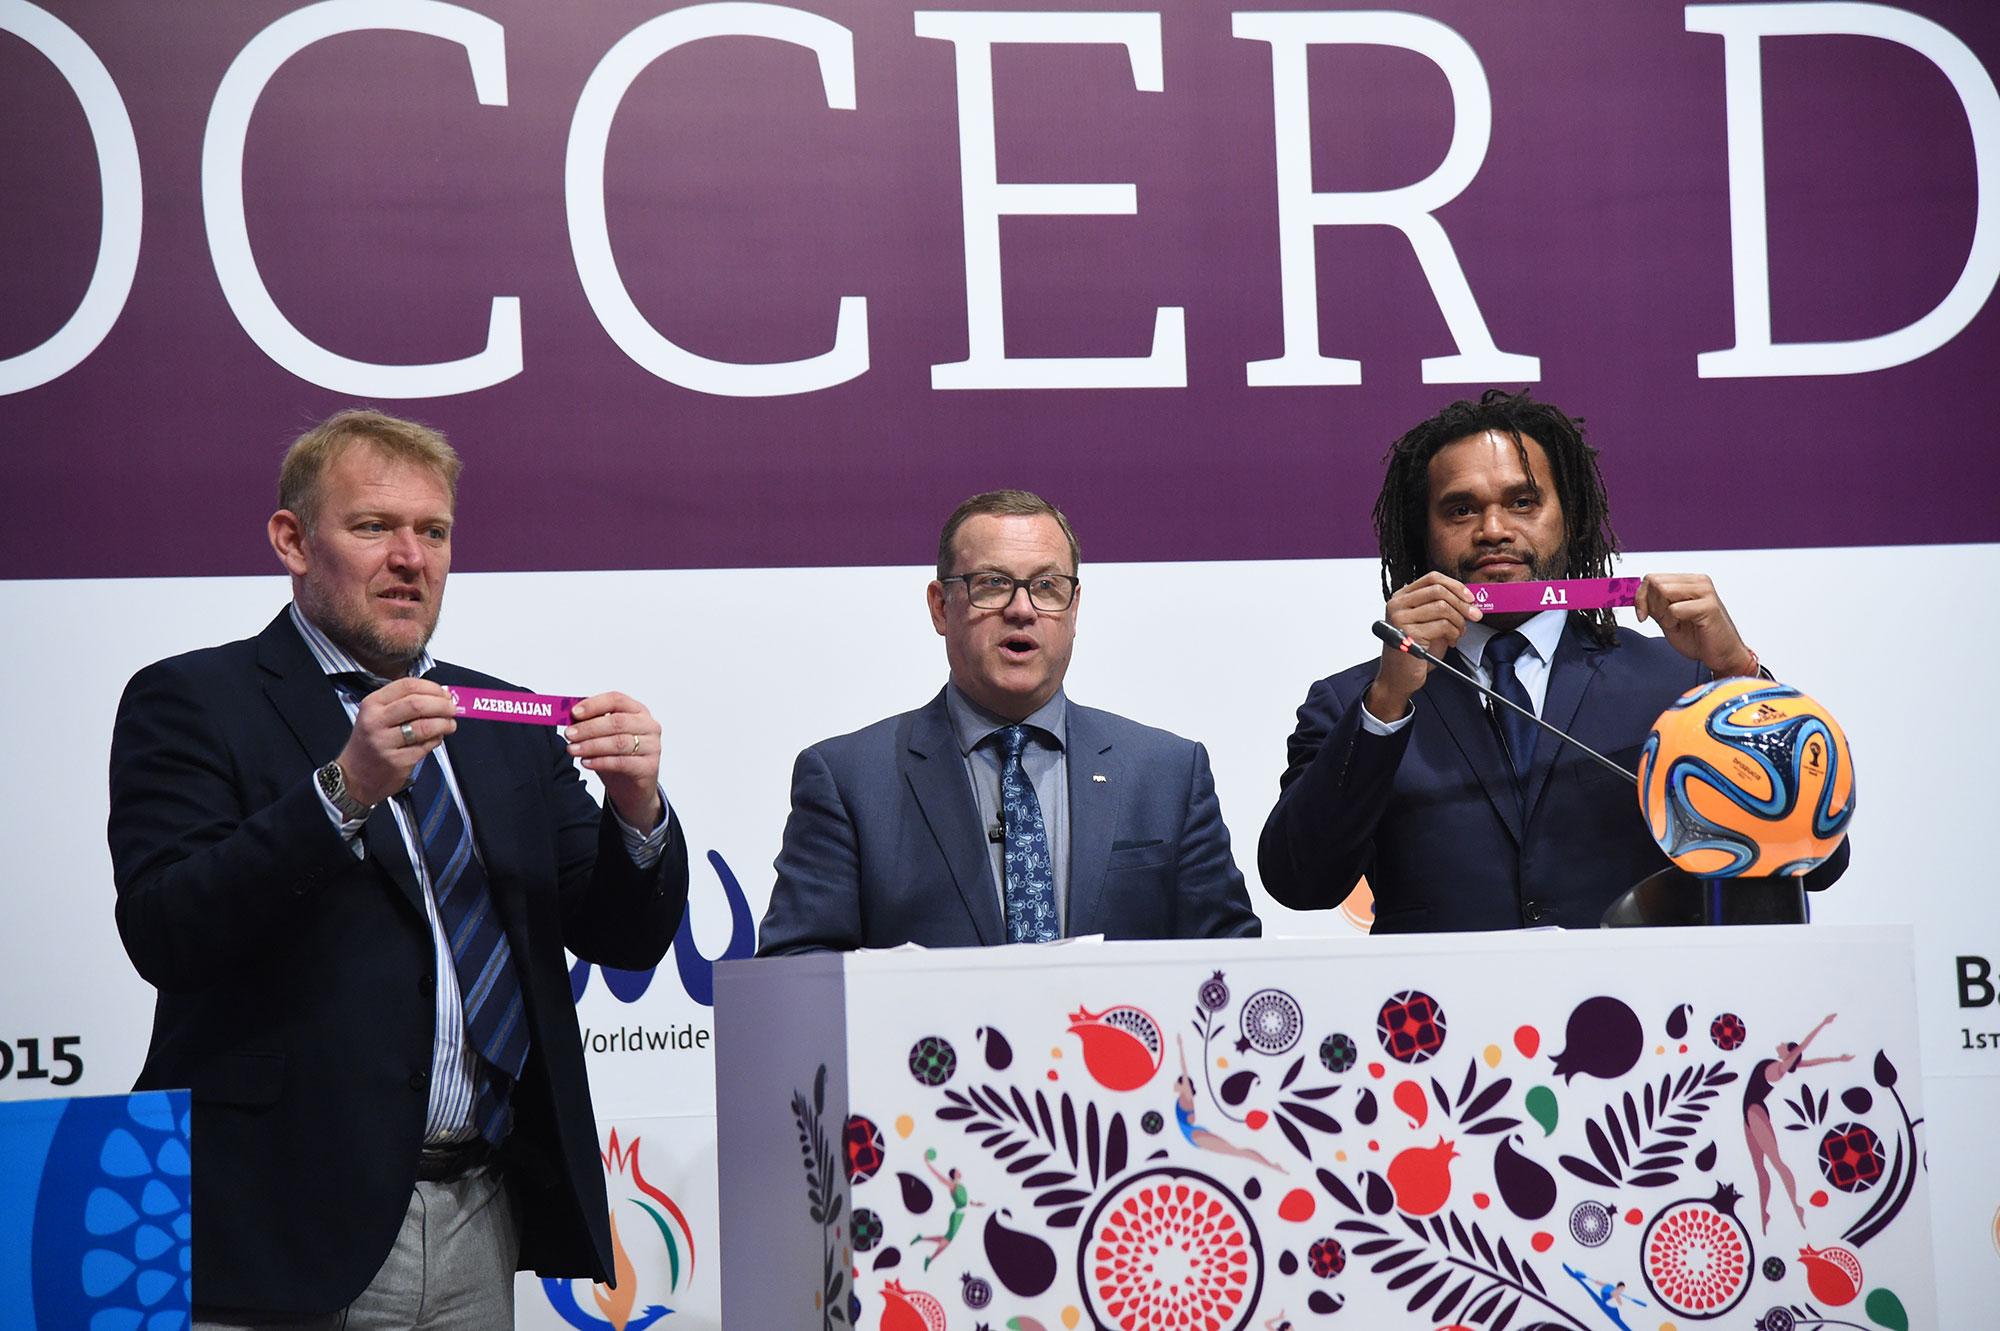 Former international footballers Christian Karembeu and Robert Prosinečki took part in the draw for the Baku 2015 beach soccer draw ©Baku 2015